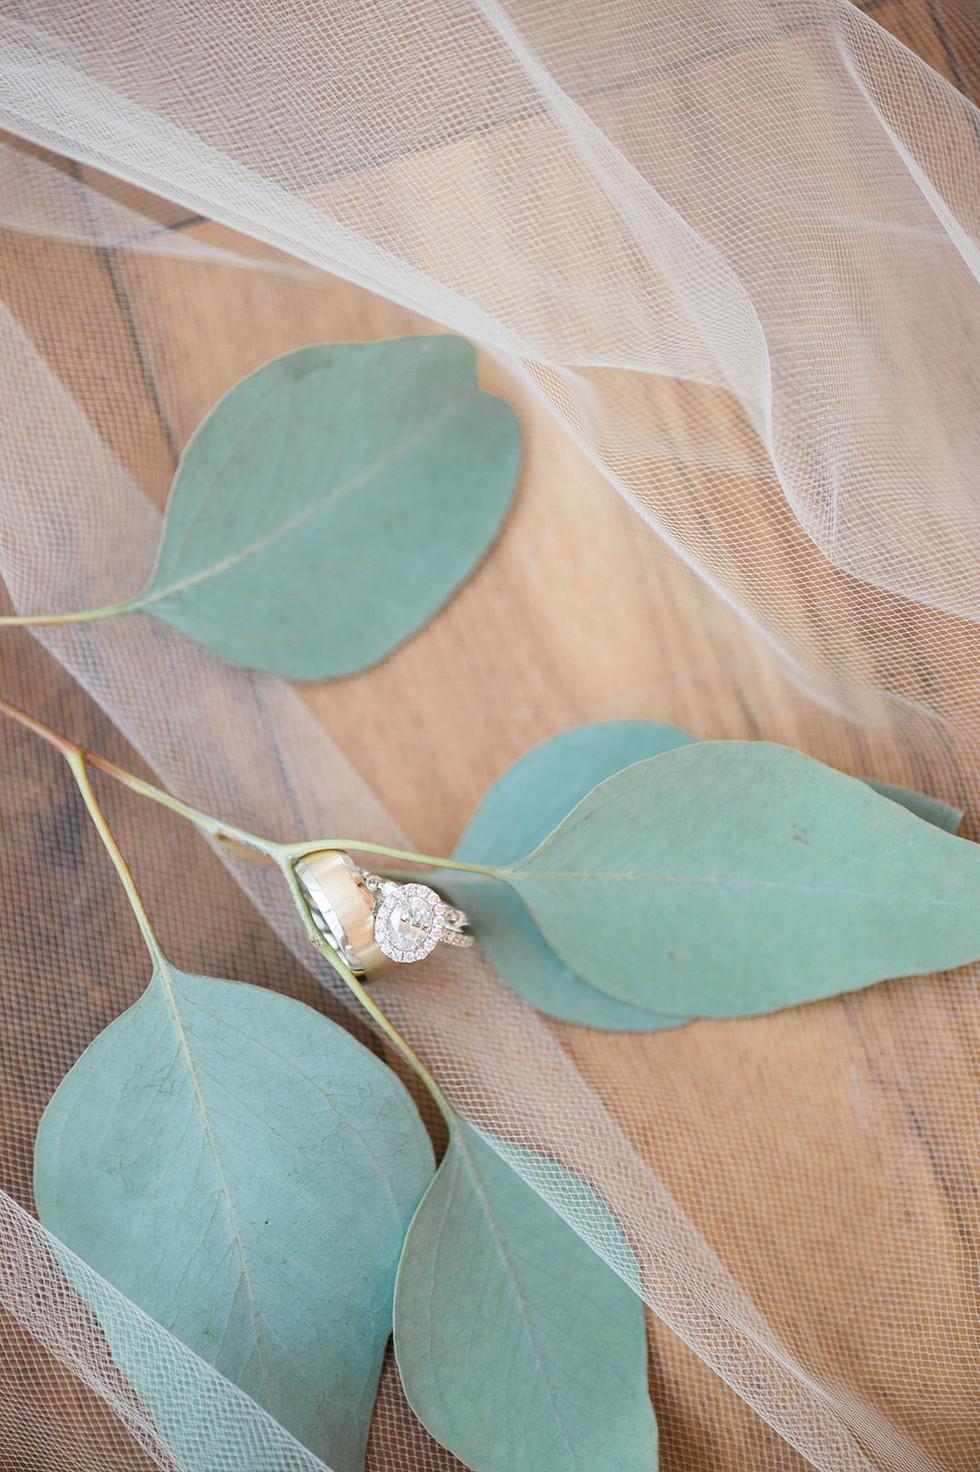 Photographer - Missy Loves Jerry Florist - Watered Garden Wedding Coordinator - Jennifer Viscosi Hair and Makeup - Wink